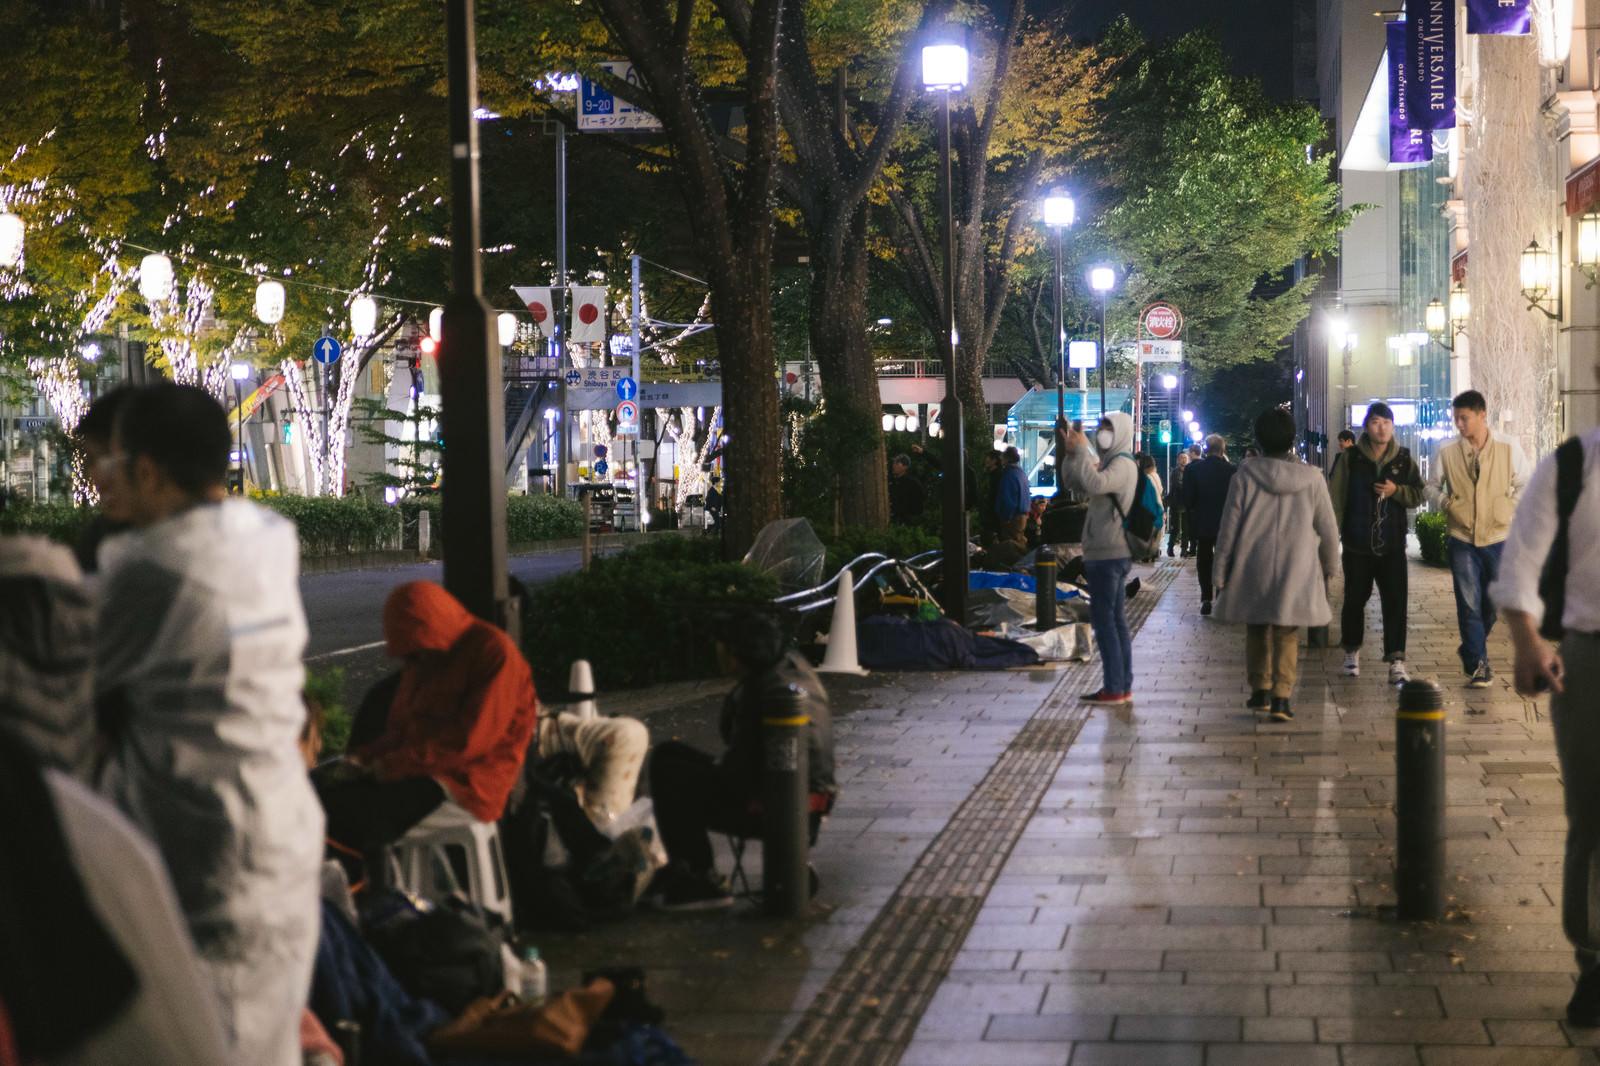 「iPhone行列と表参道の人達」の写真